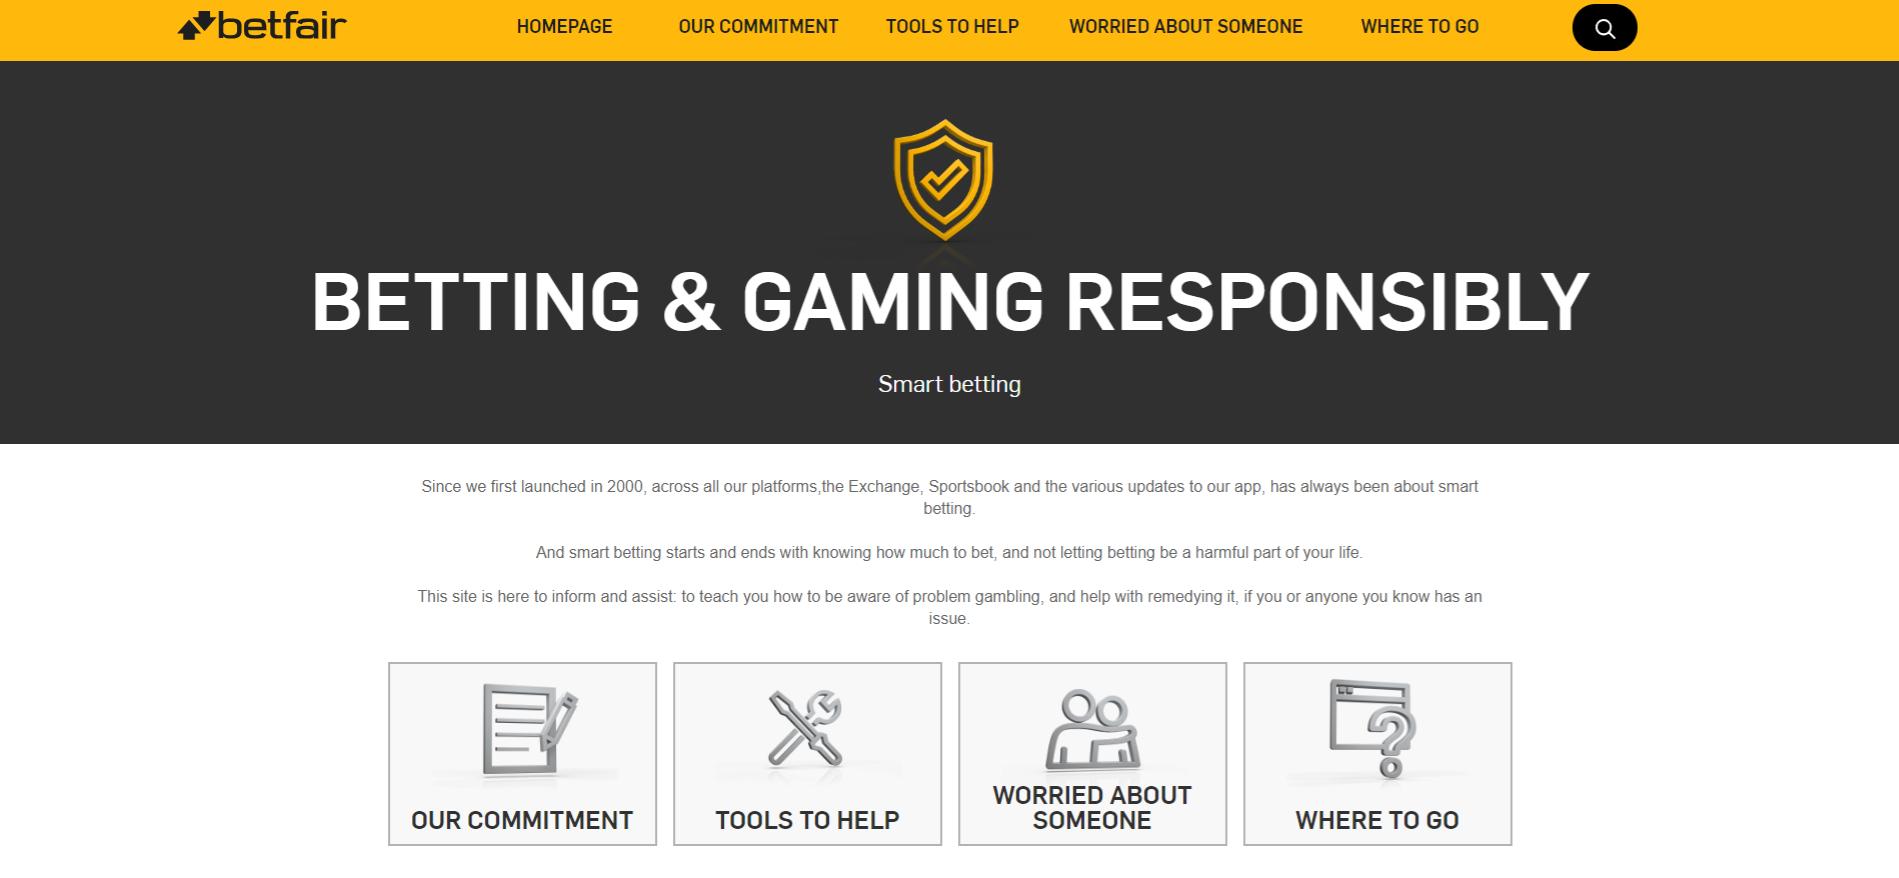 betfair promotes responsible gaming